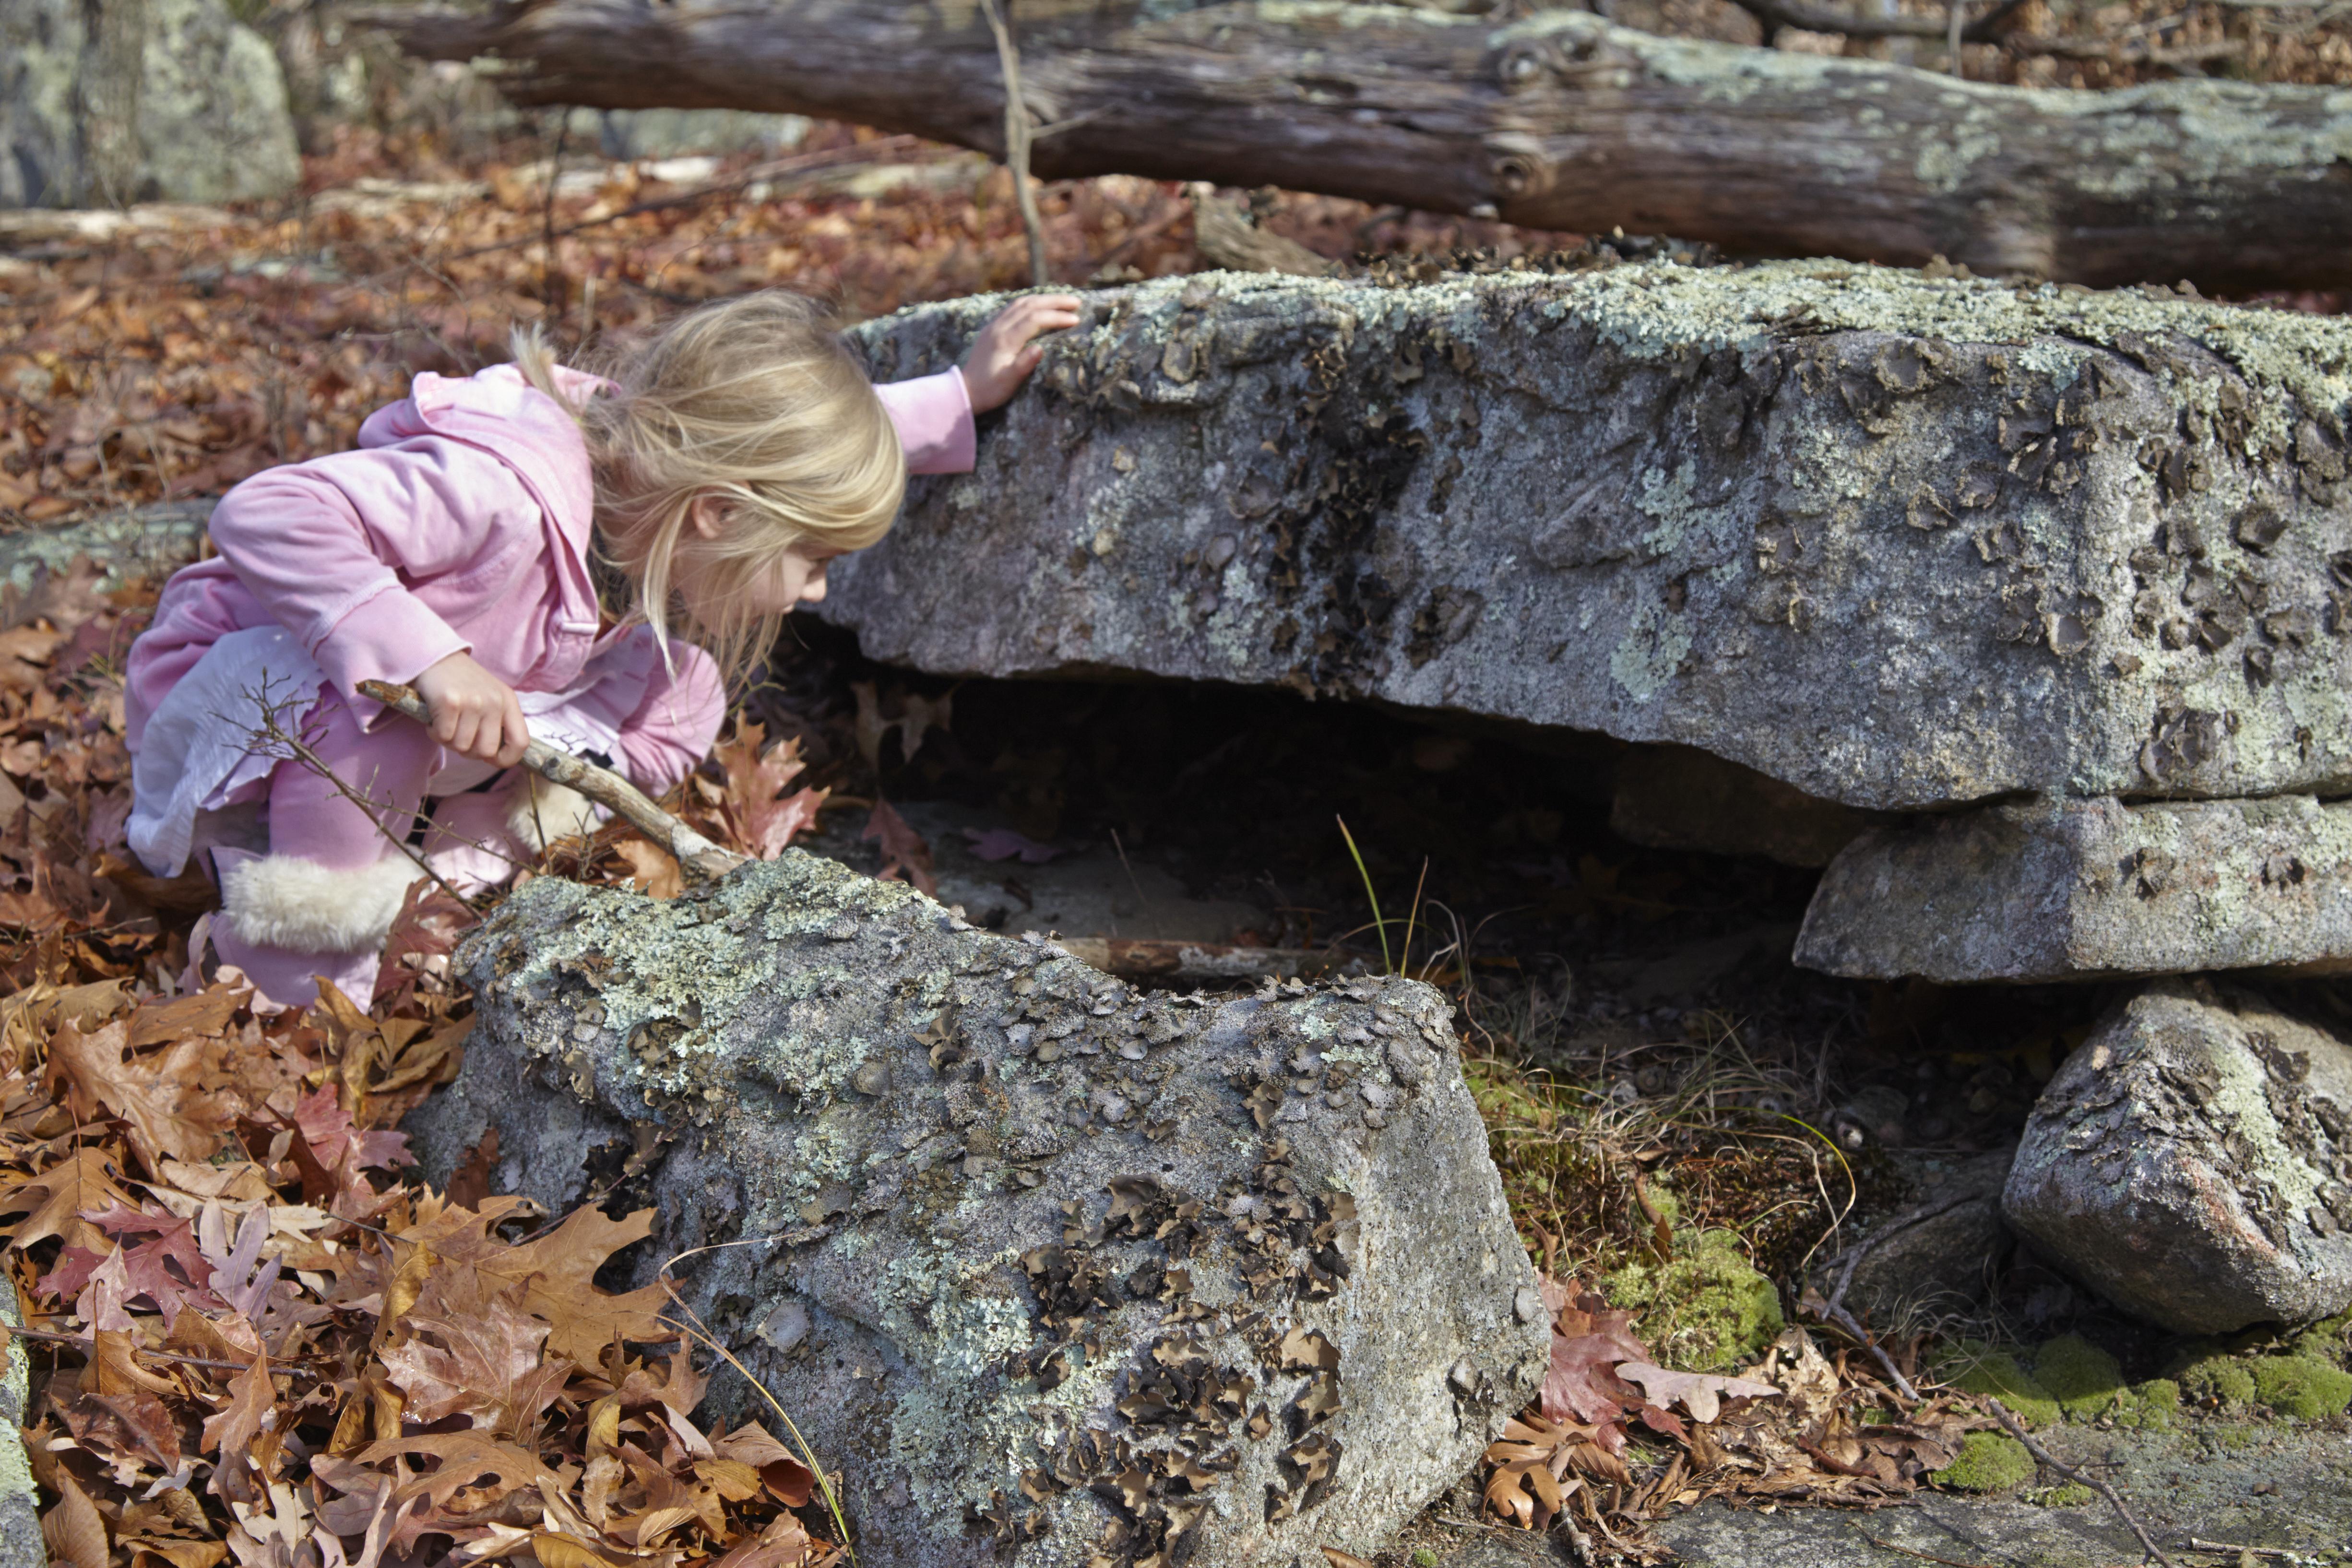 A child exploring The Preserve. Photo credit Bob Lorenz.